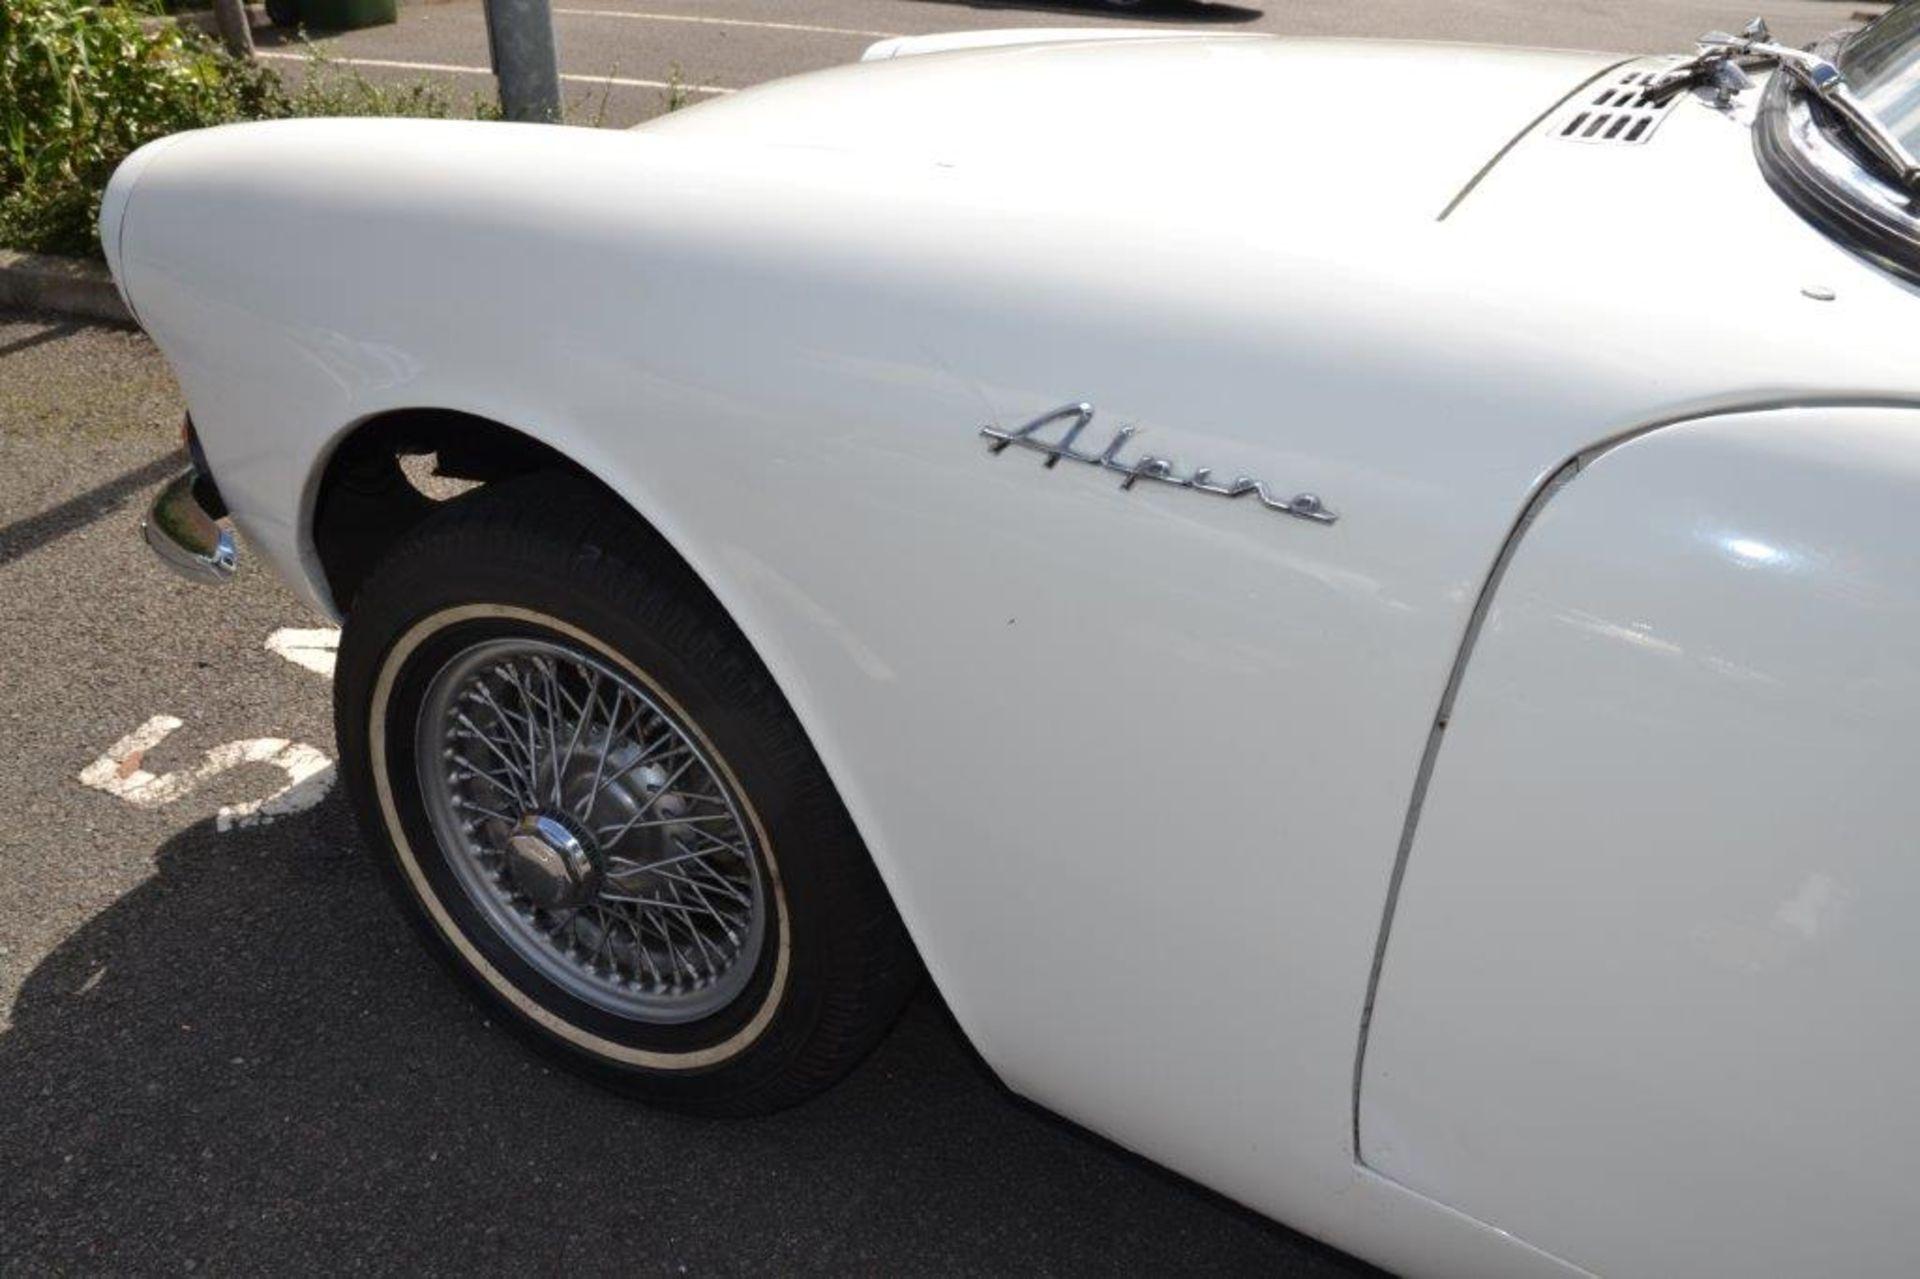 1967 Sunbeam Alpine Series V - Image 8 of 8